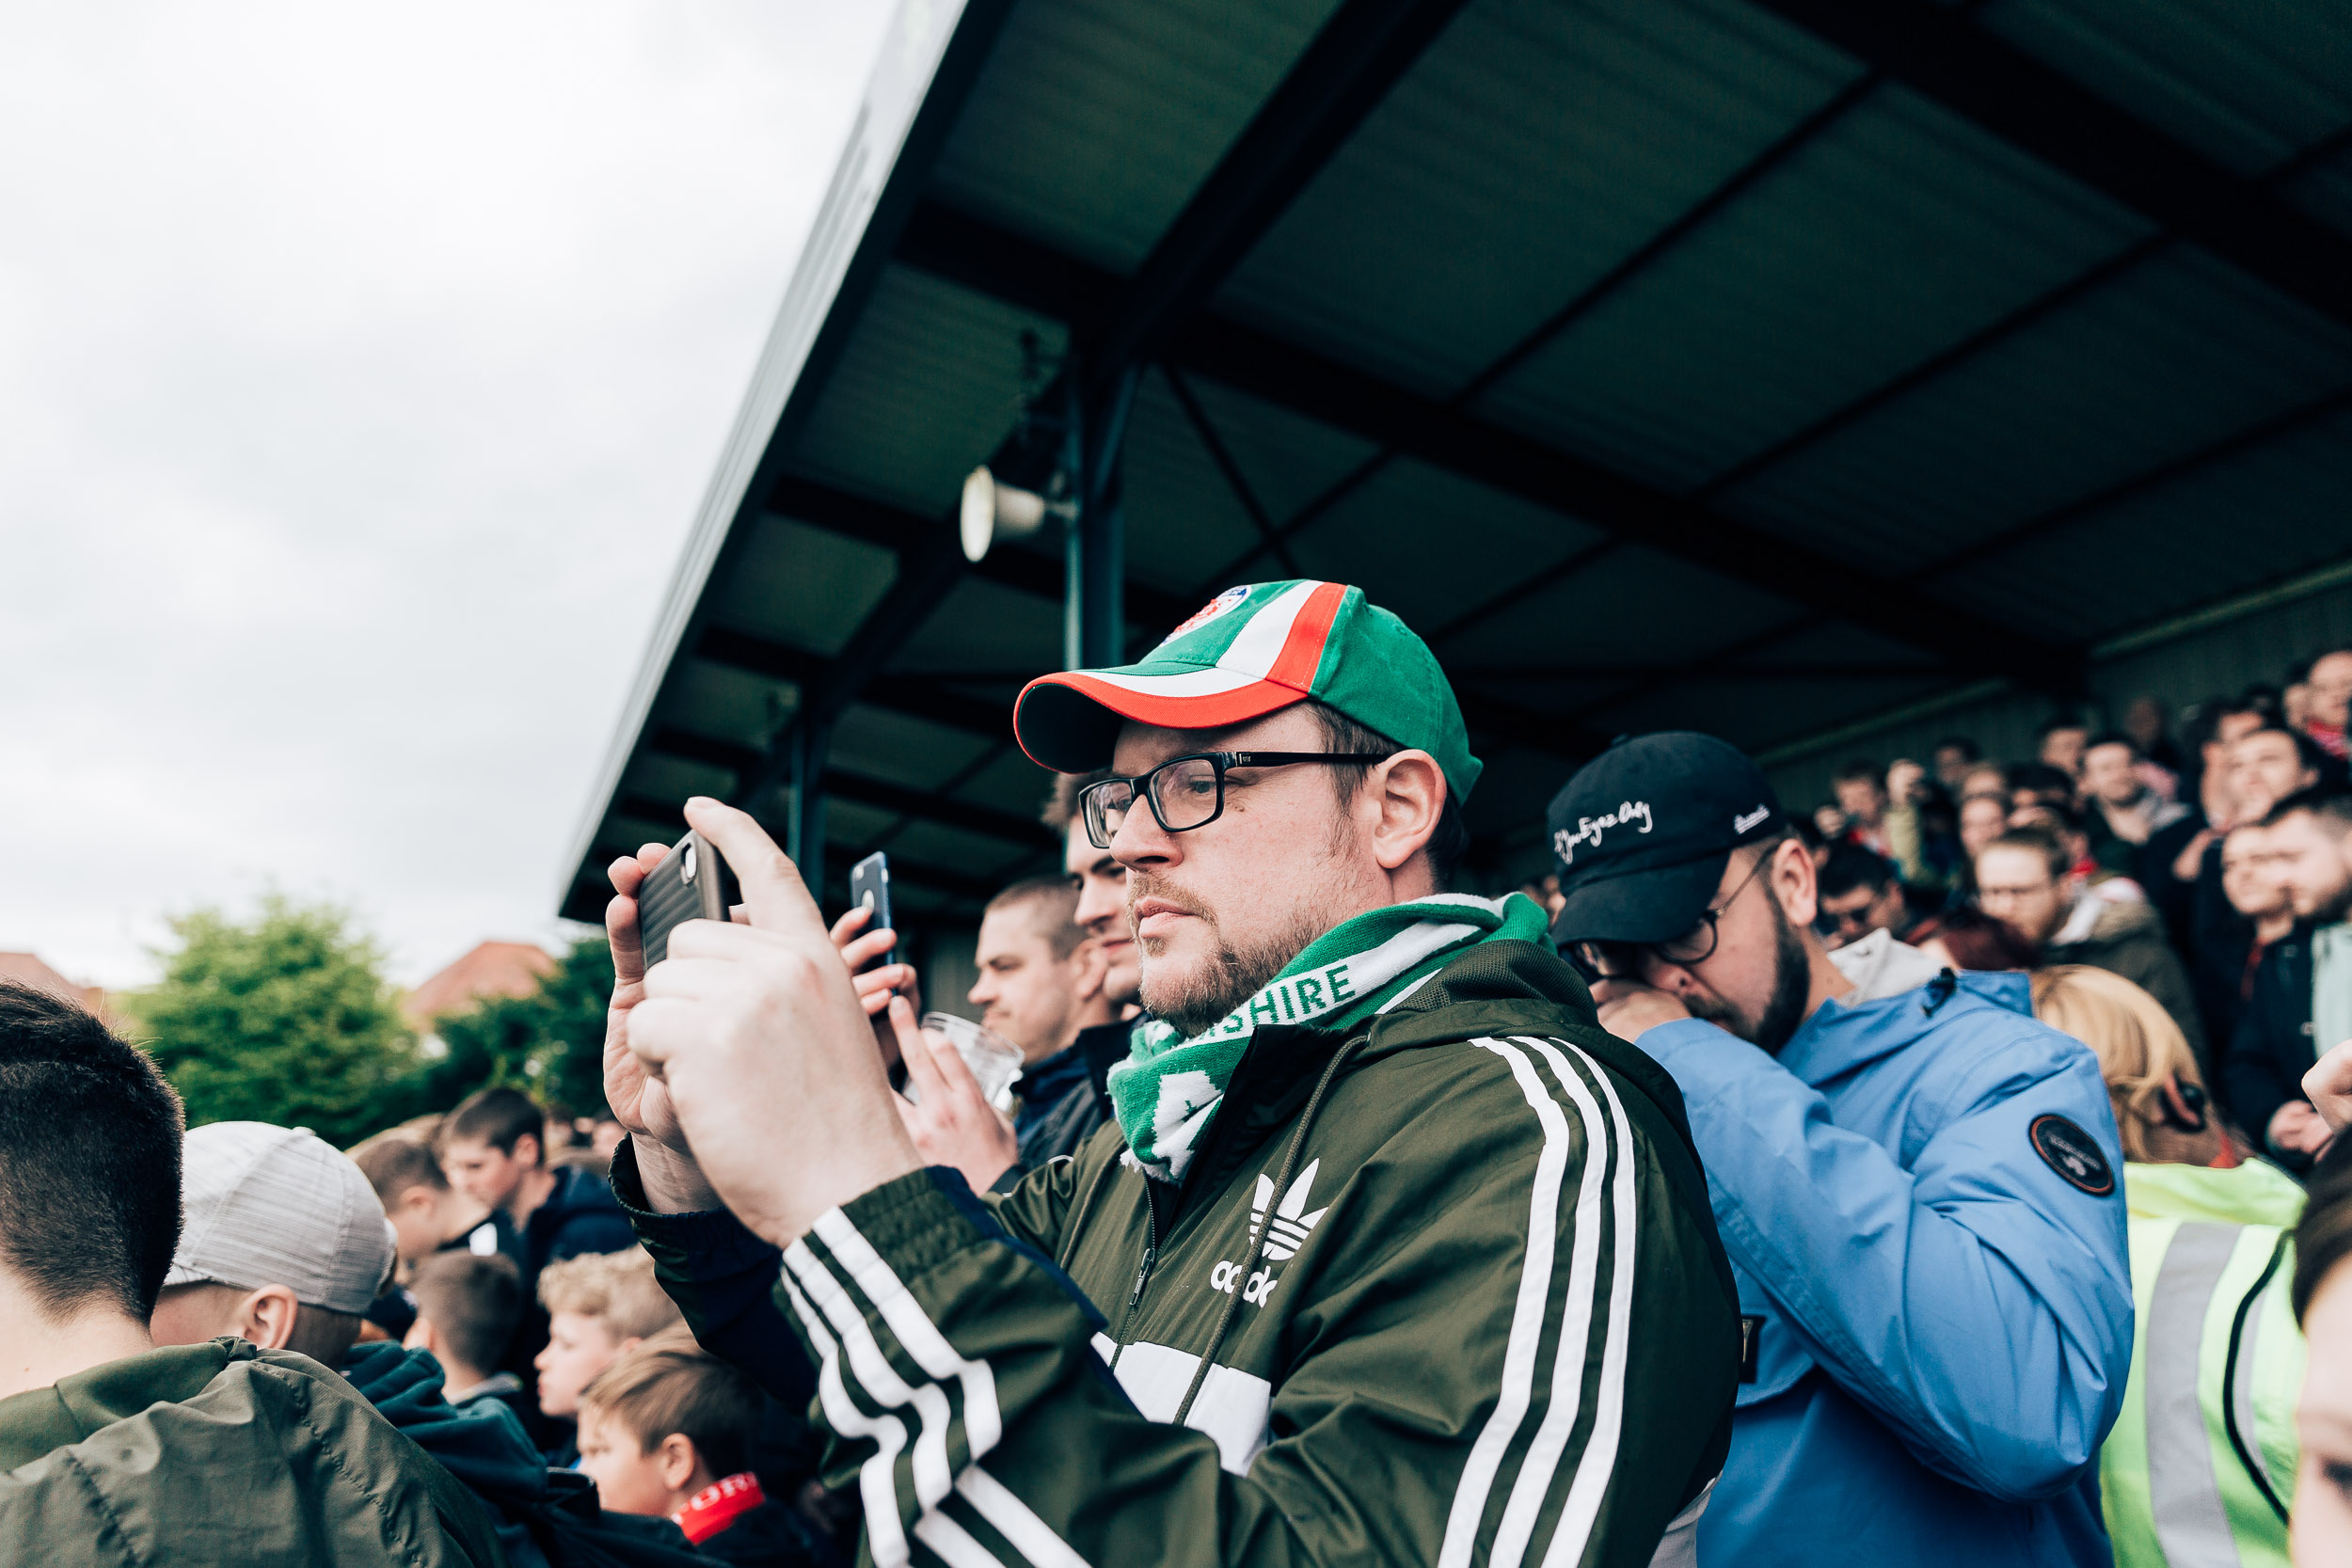 06_05_2019_Bromsgrove_Sporting_Corby-97.jpg